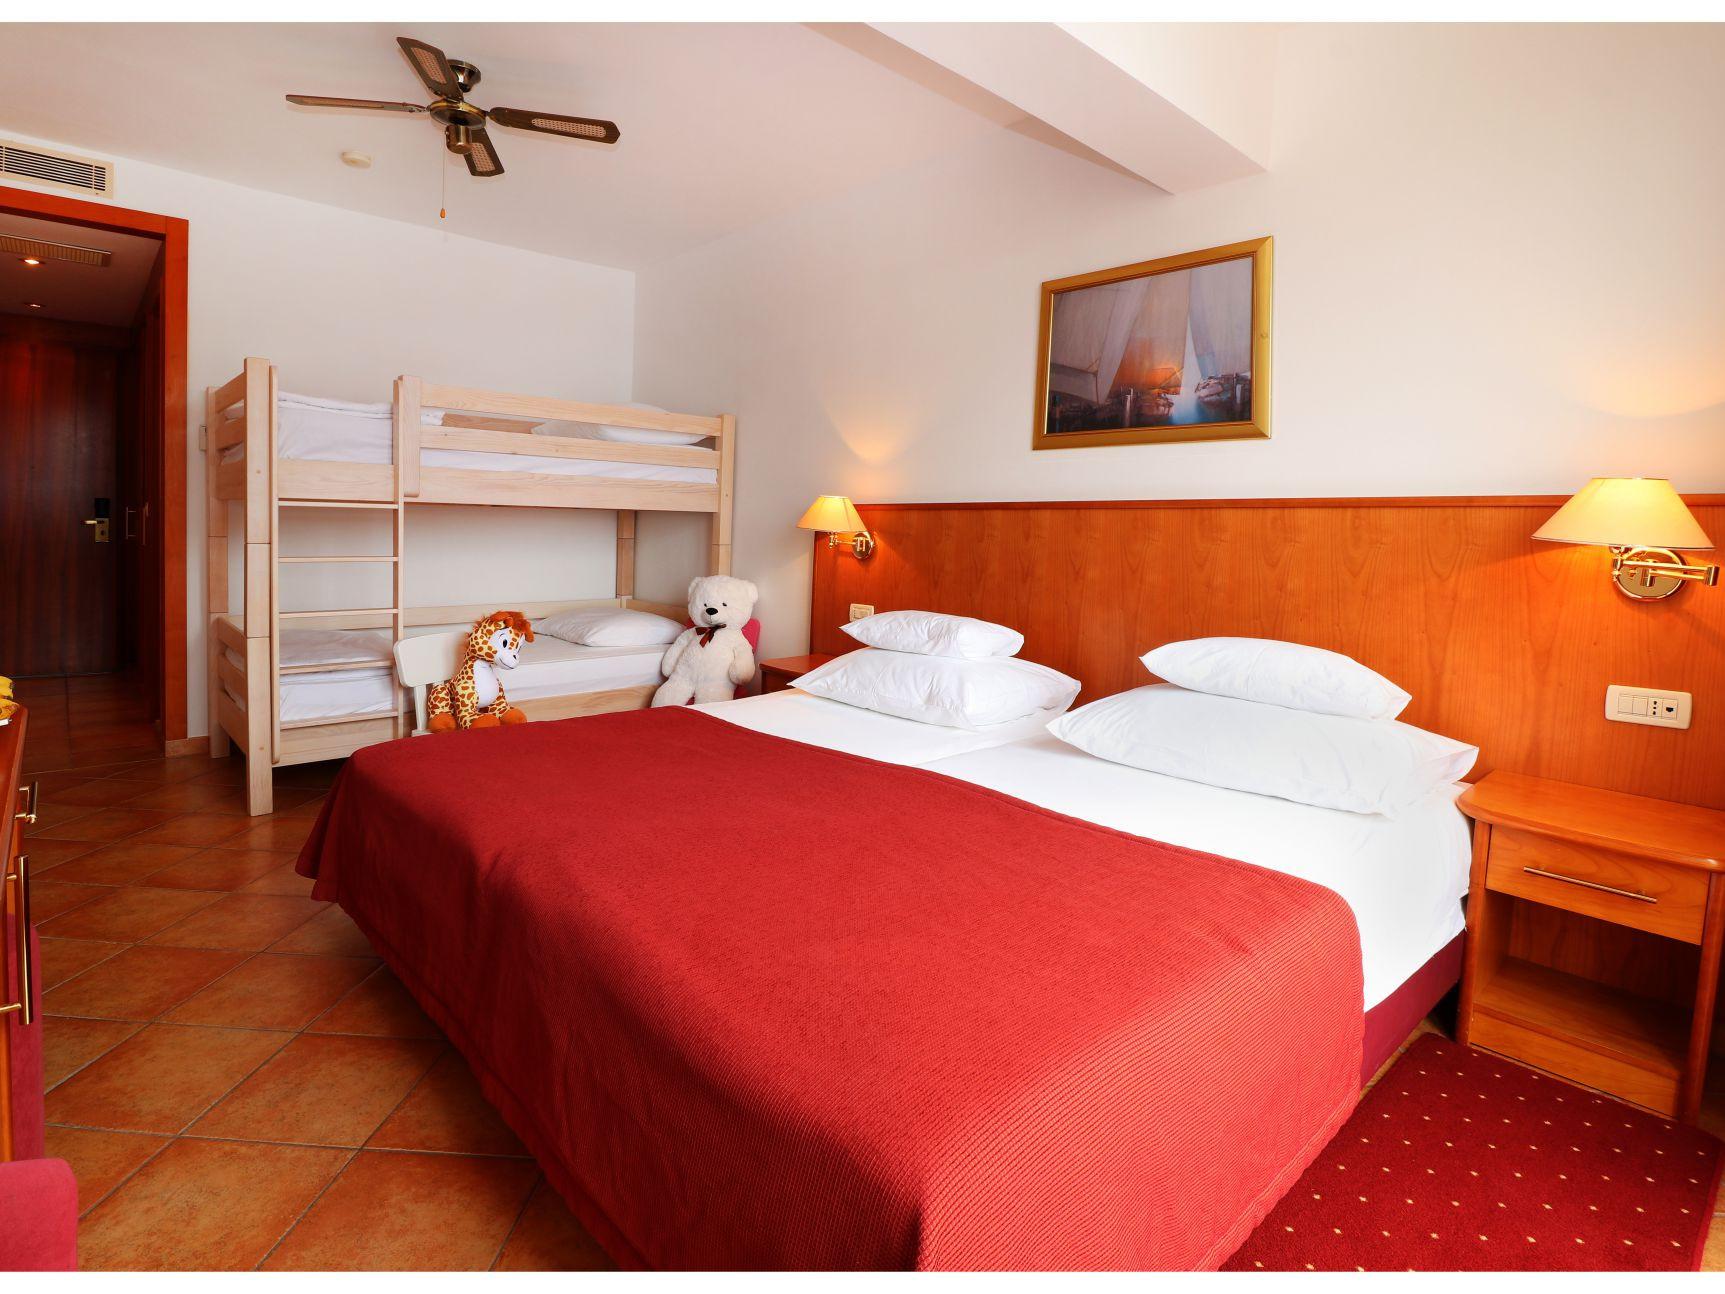 premier club mini family 43044481954 o uai - Zora Hotel